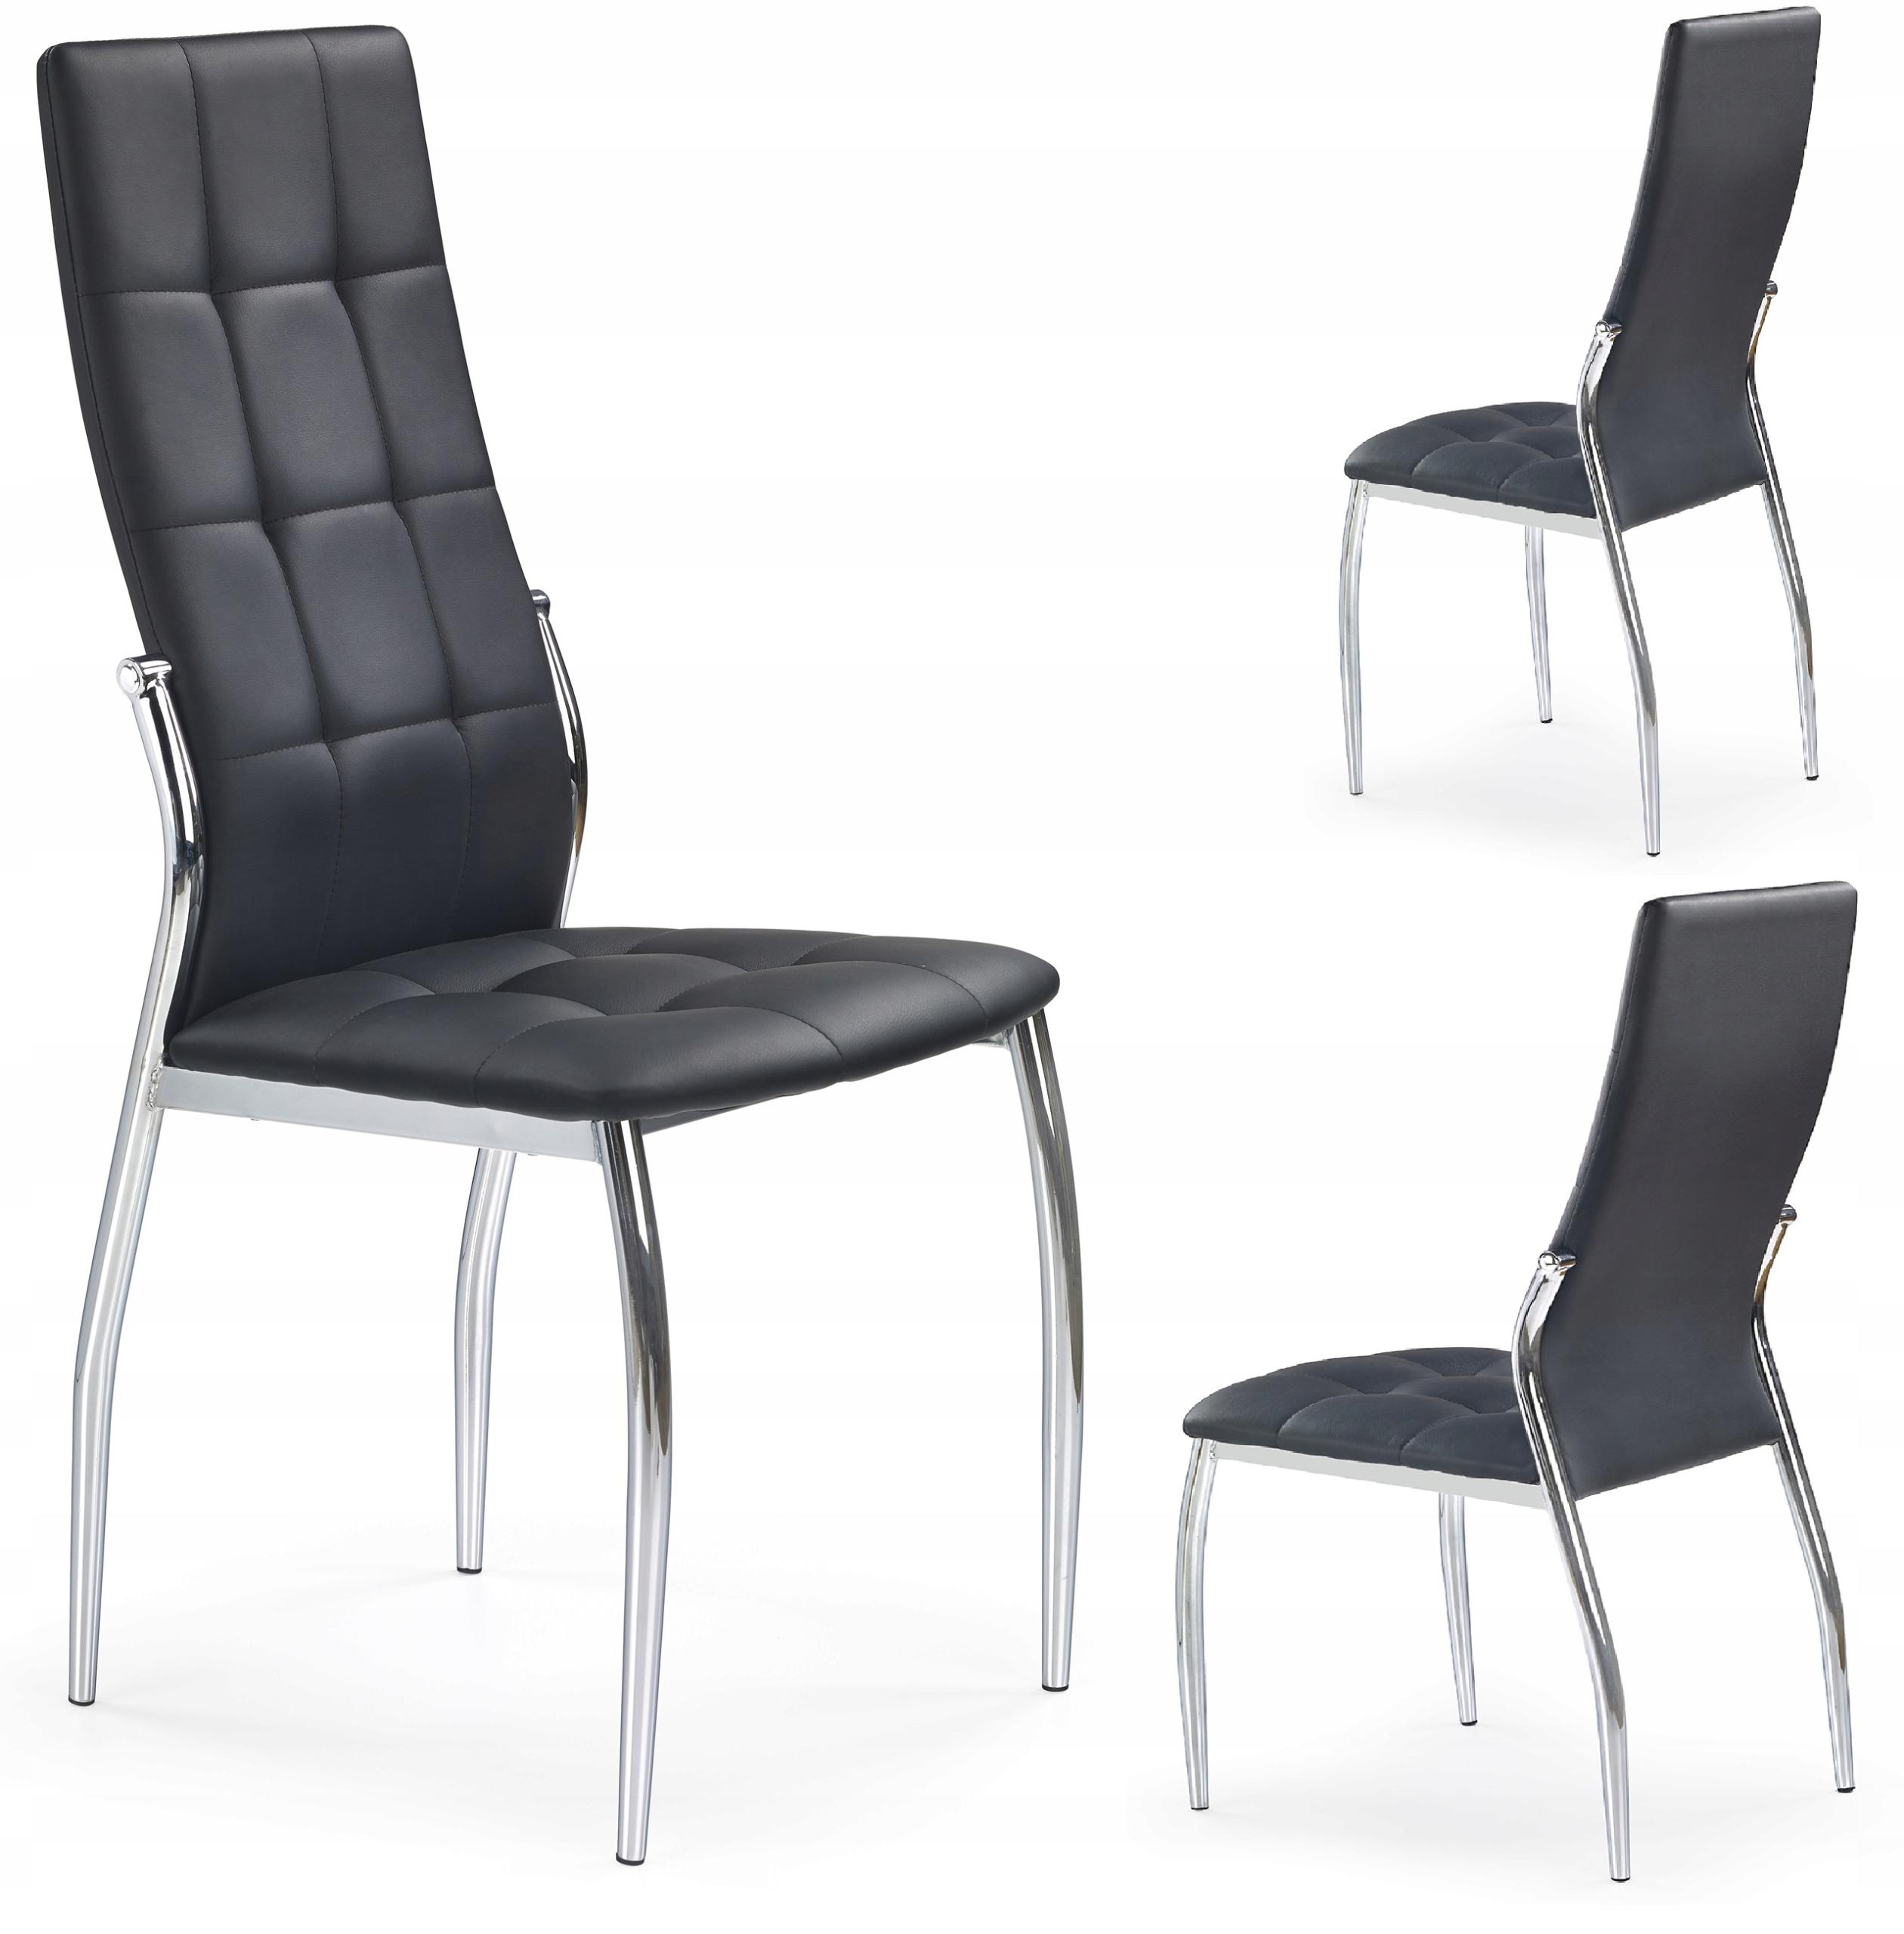 Krzesło K-209 K209 Chrom Eco Skóra Halmar Czarny